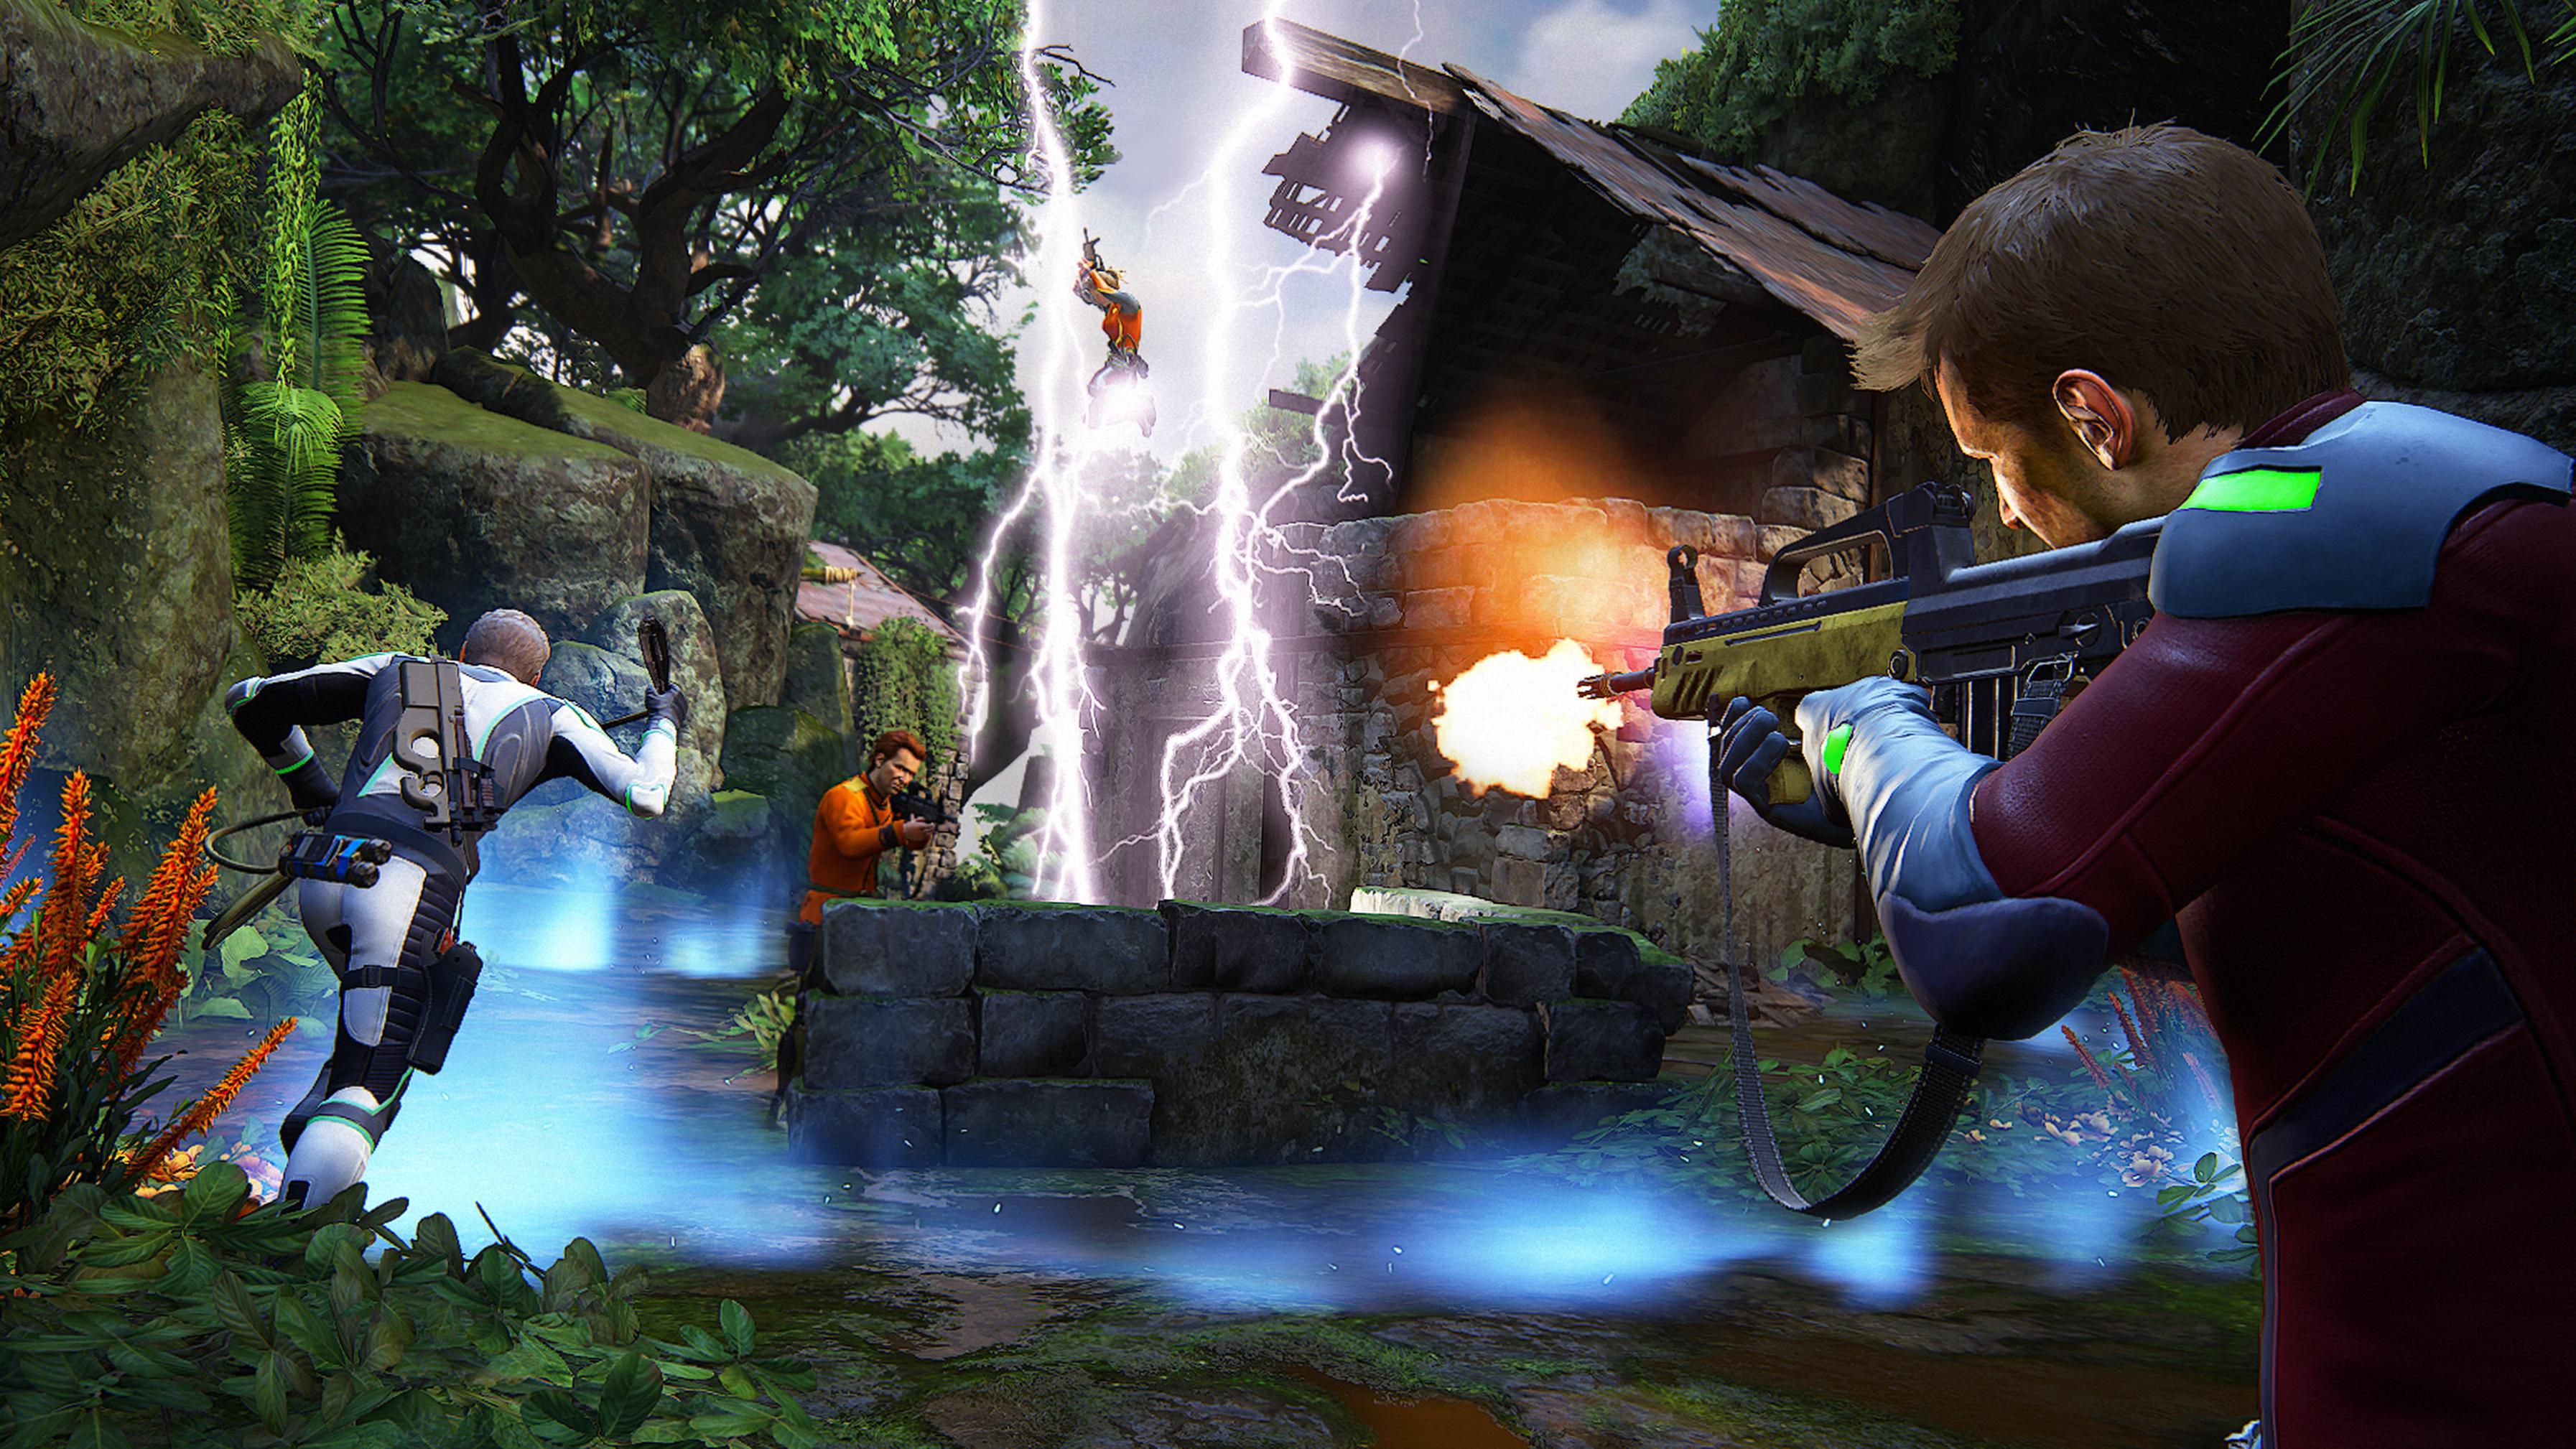 Uncharted 4: Test, Lösung, DLCs, Trailer - Alle Infos zum ...  Uncharted 4: Te...